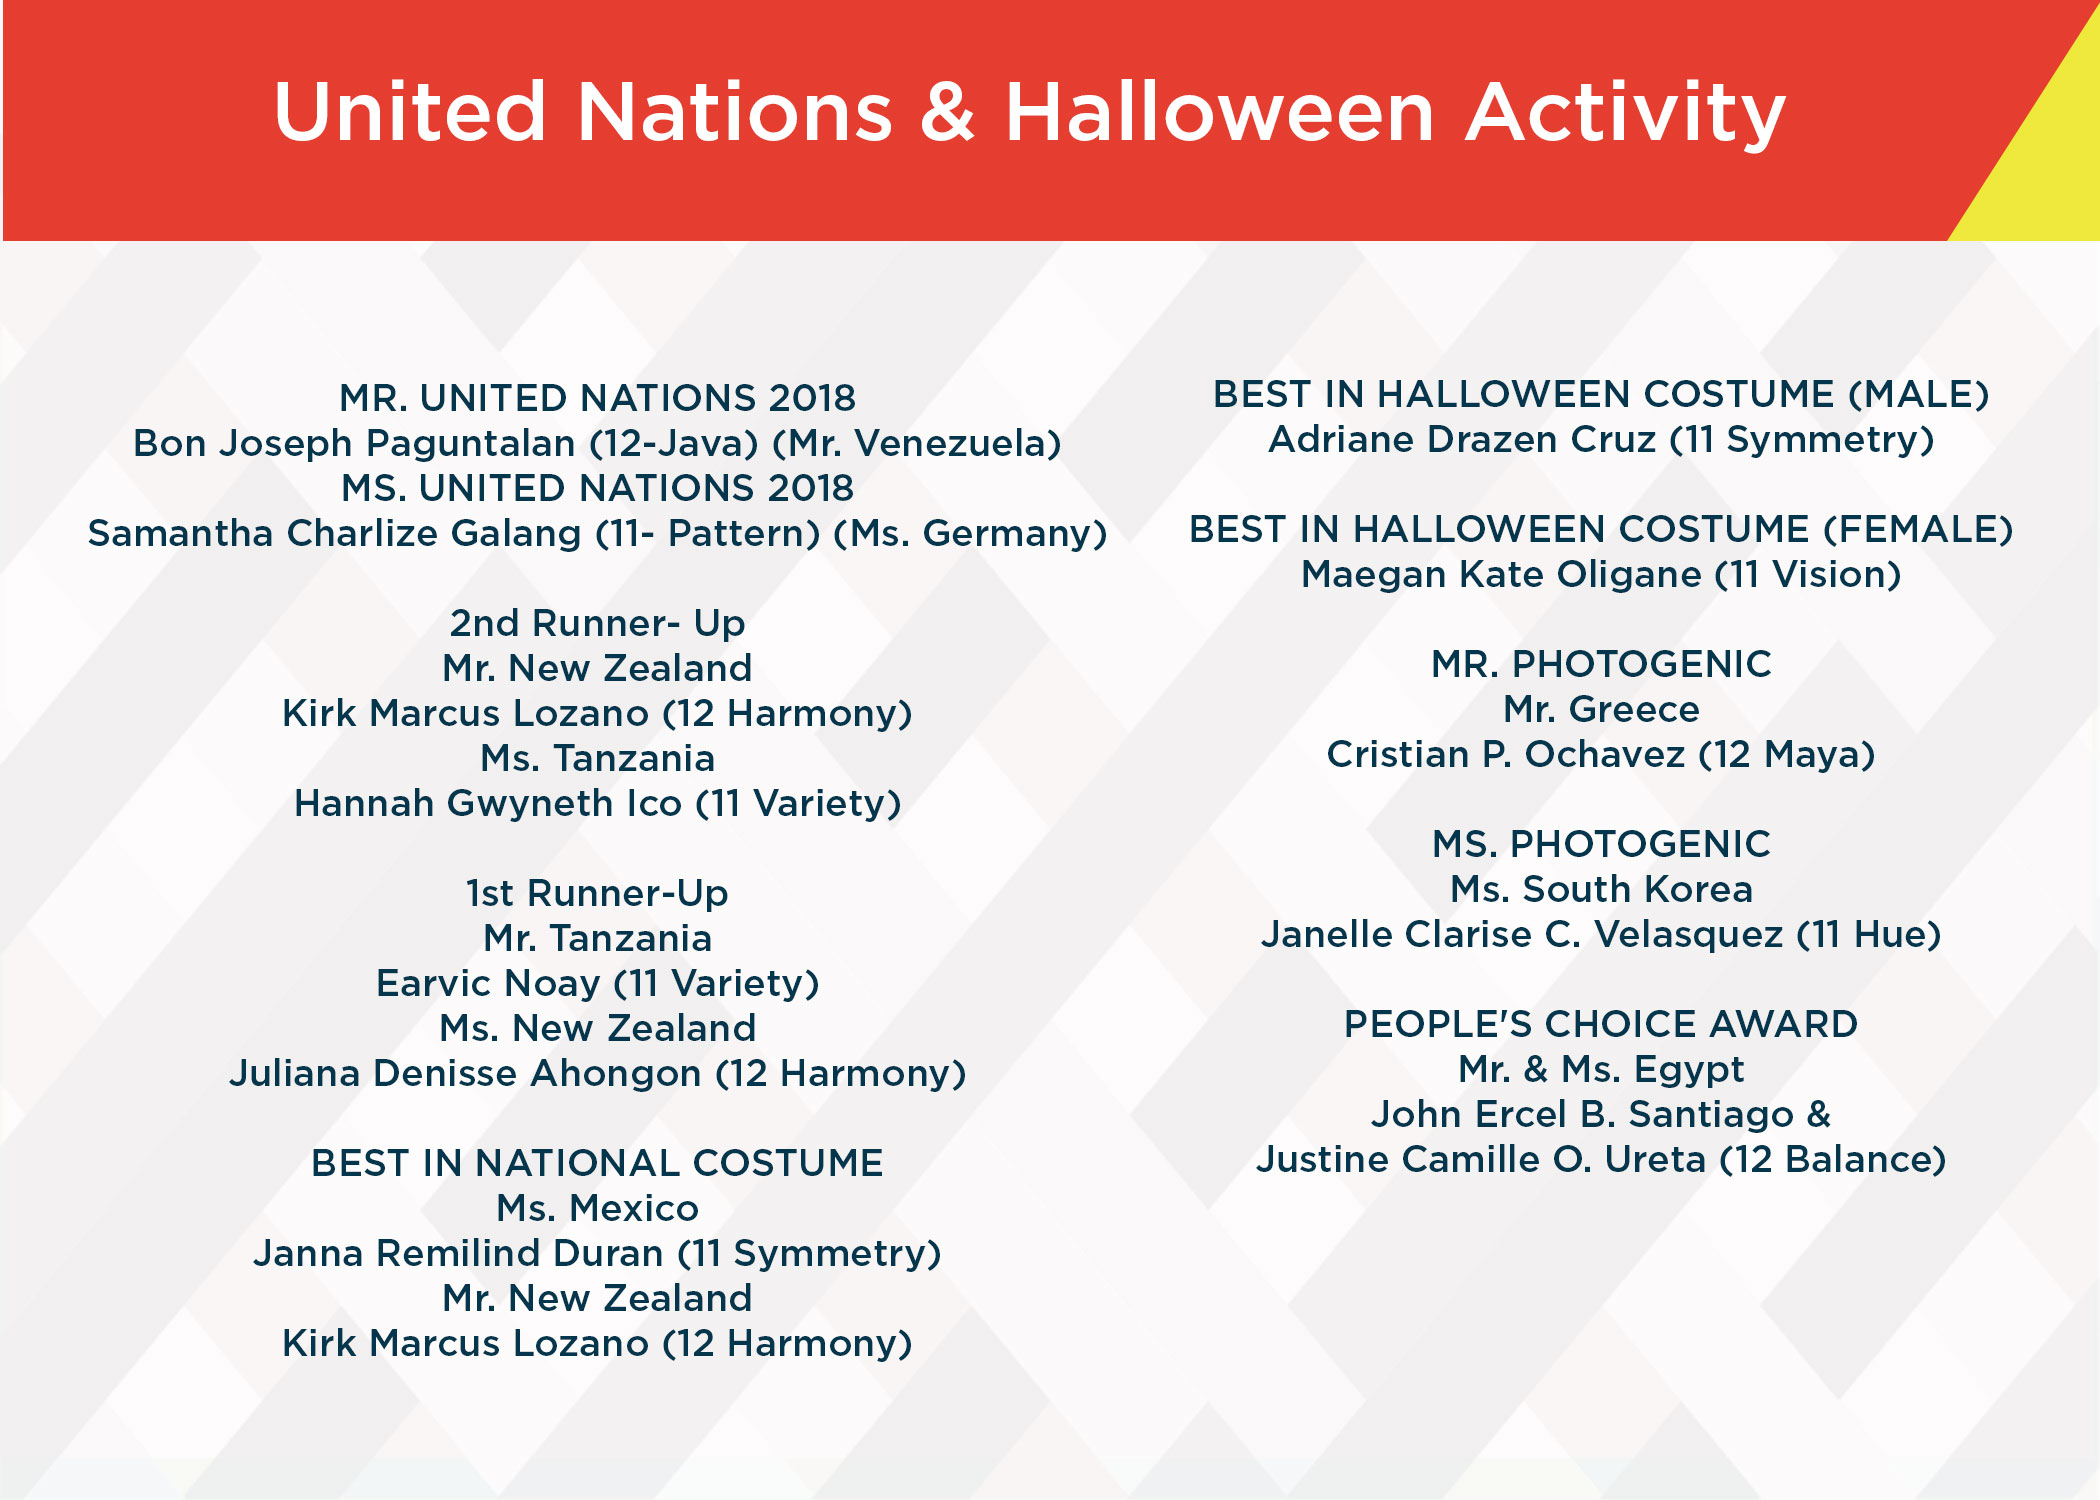 CIIT UN and Halloween Celebration Activity Winners